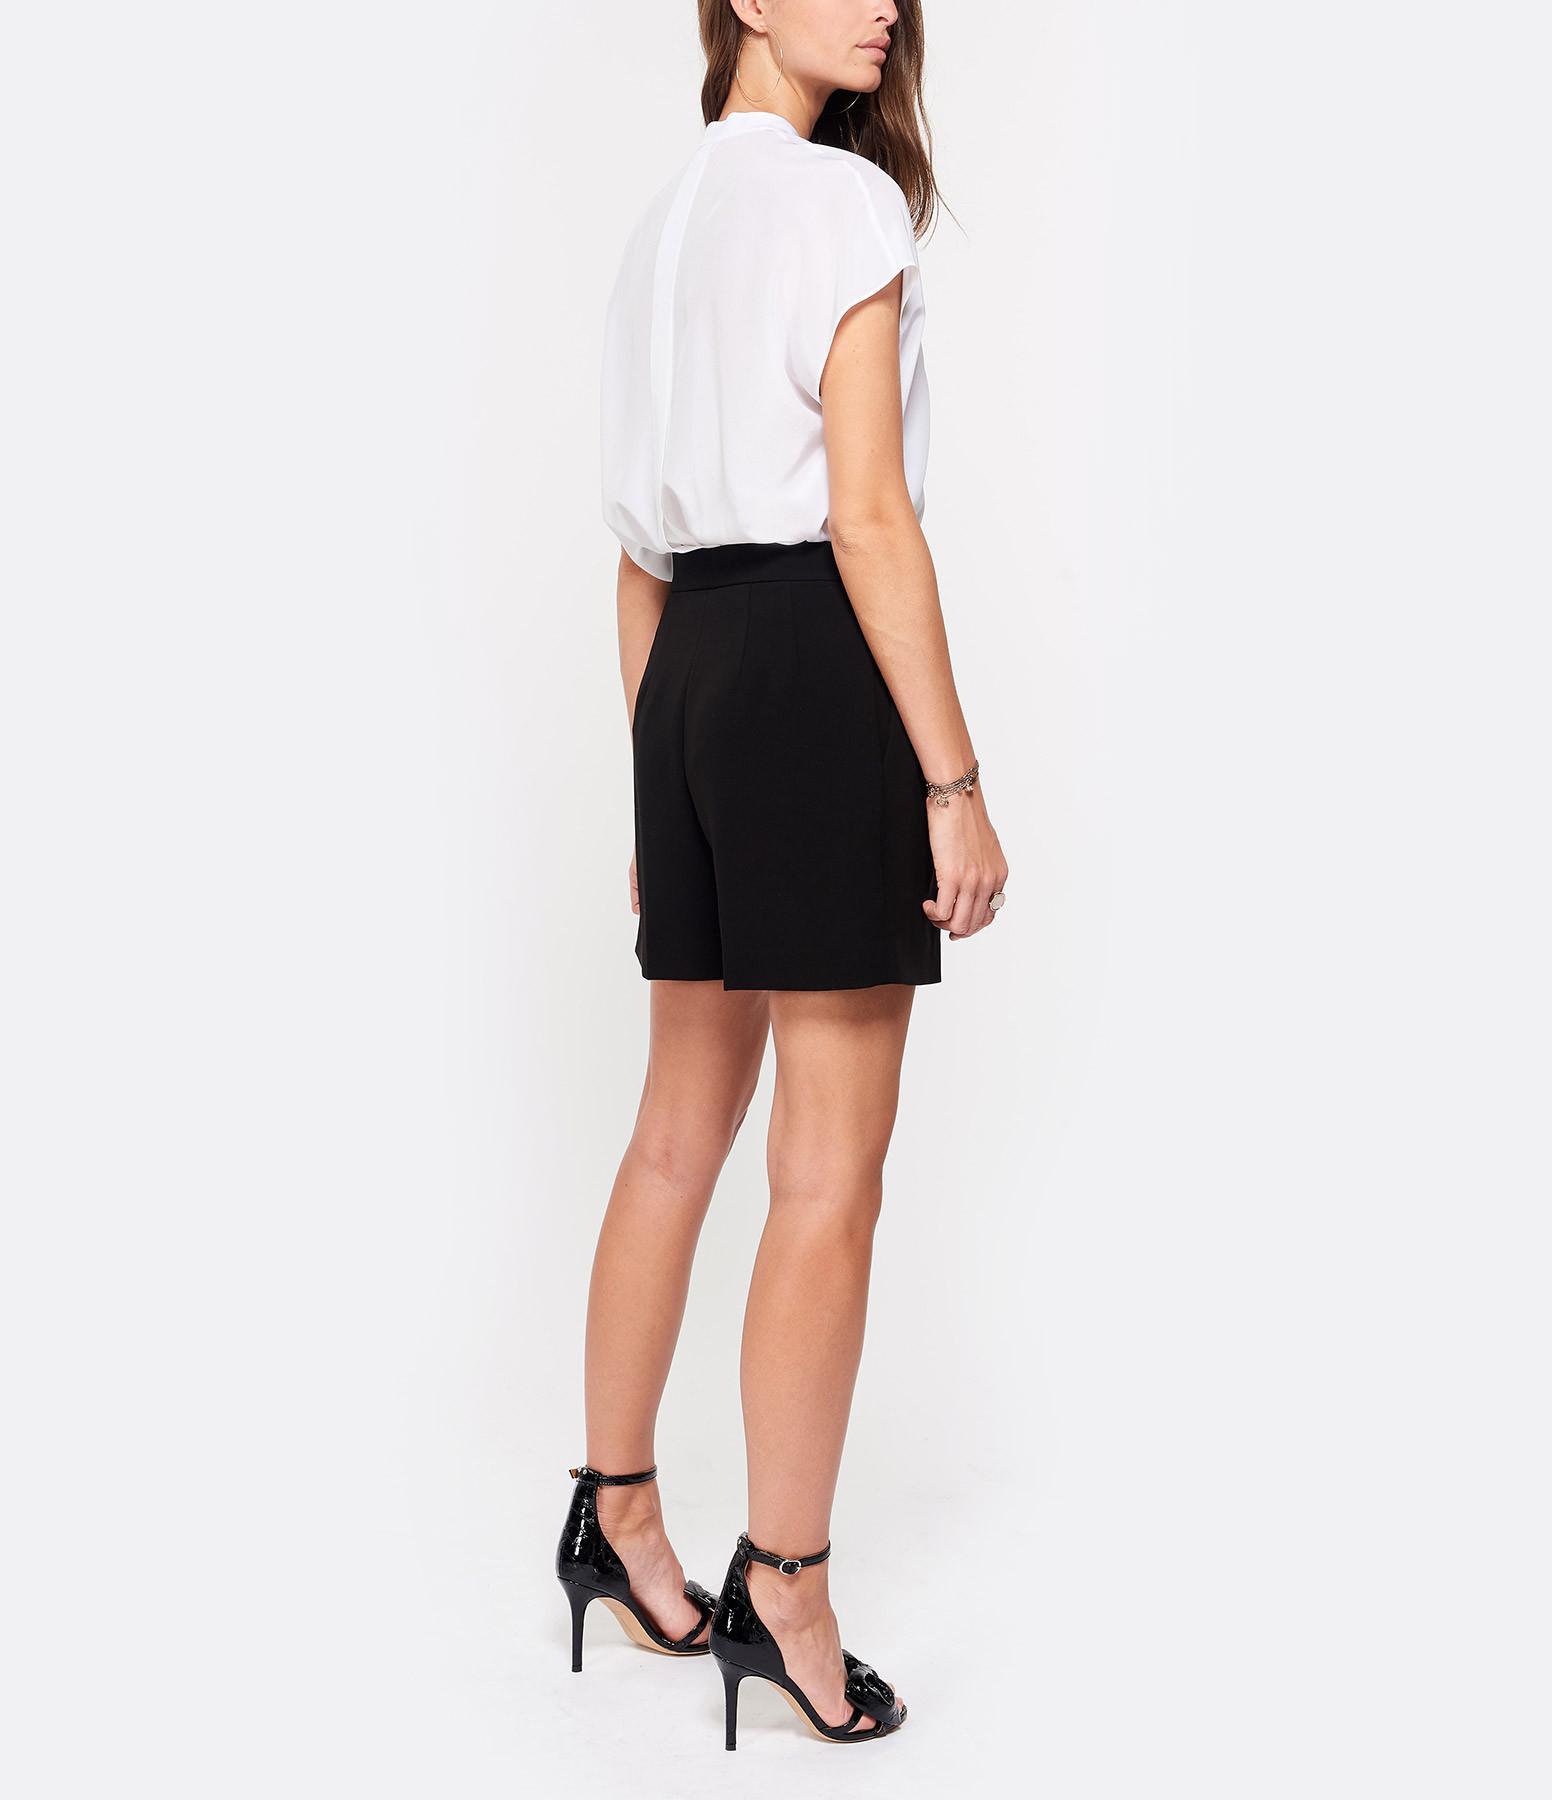 THEORY - Short Taille Haute Crèpe Noir